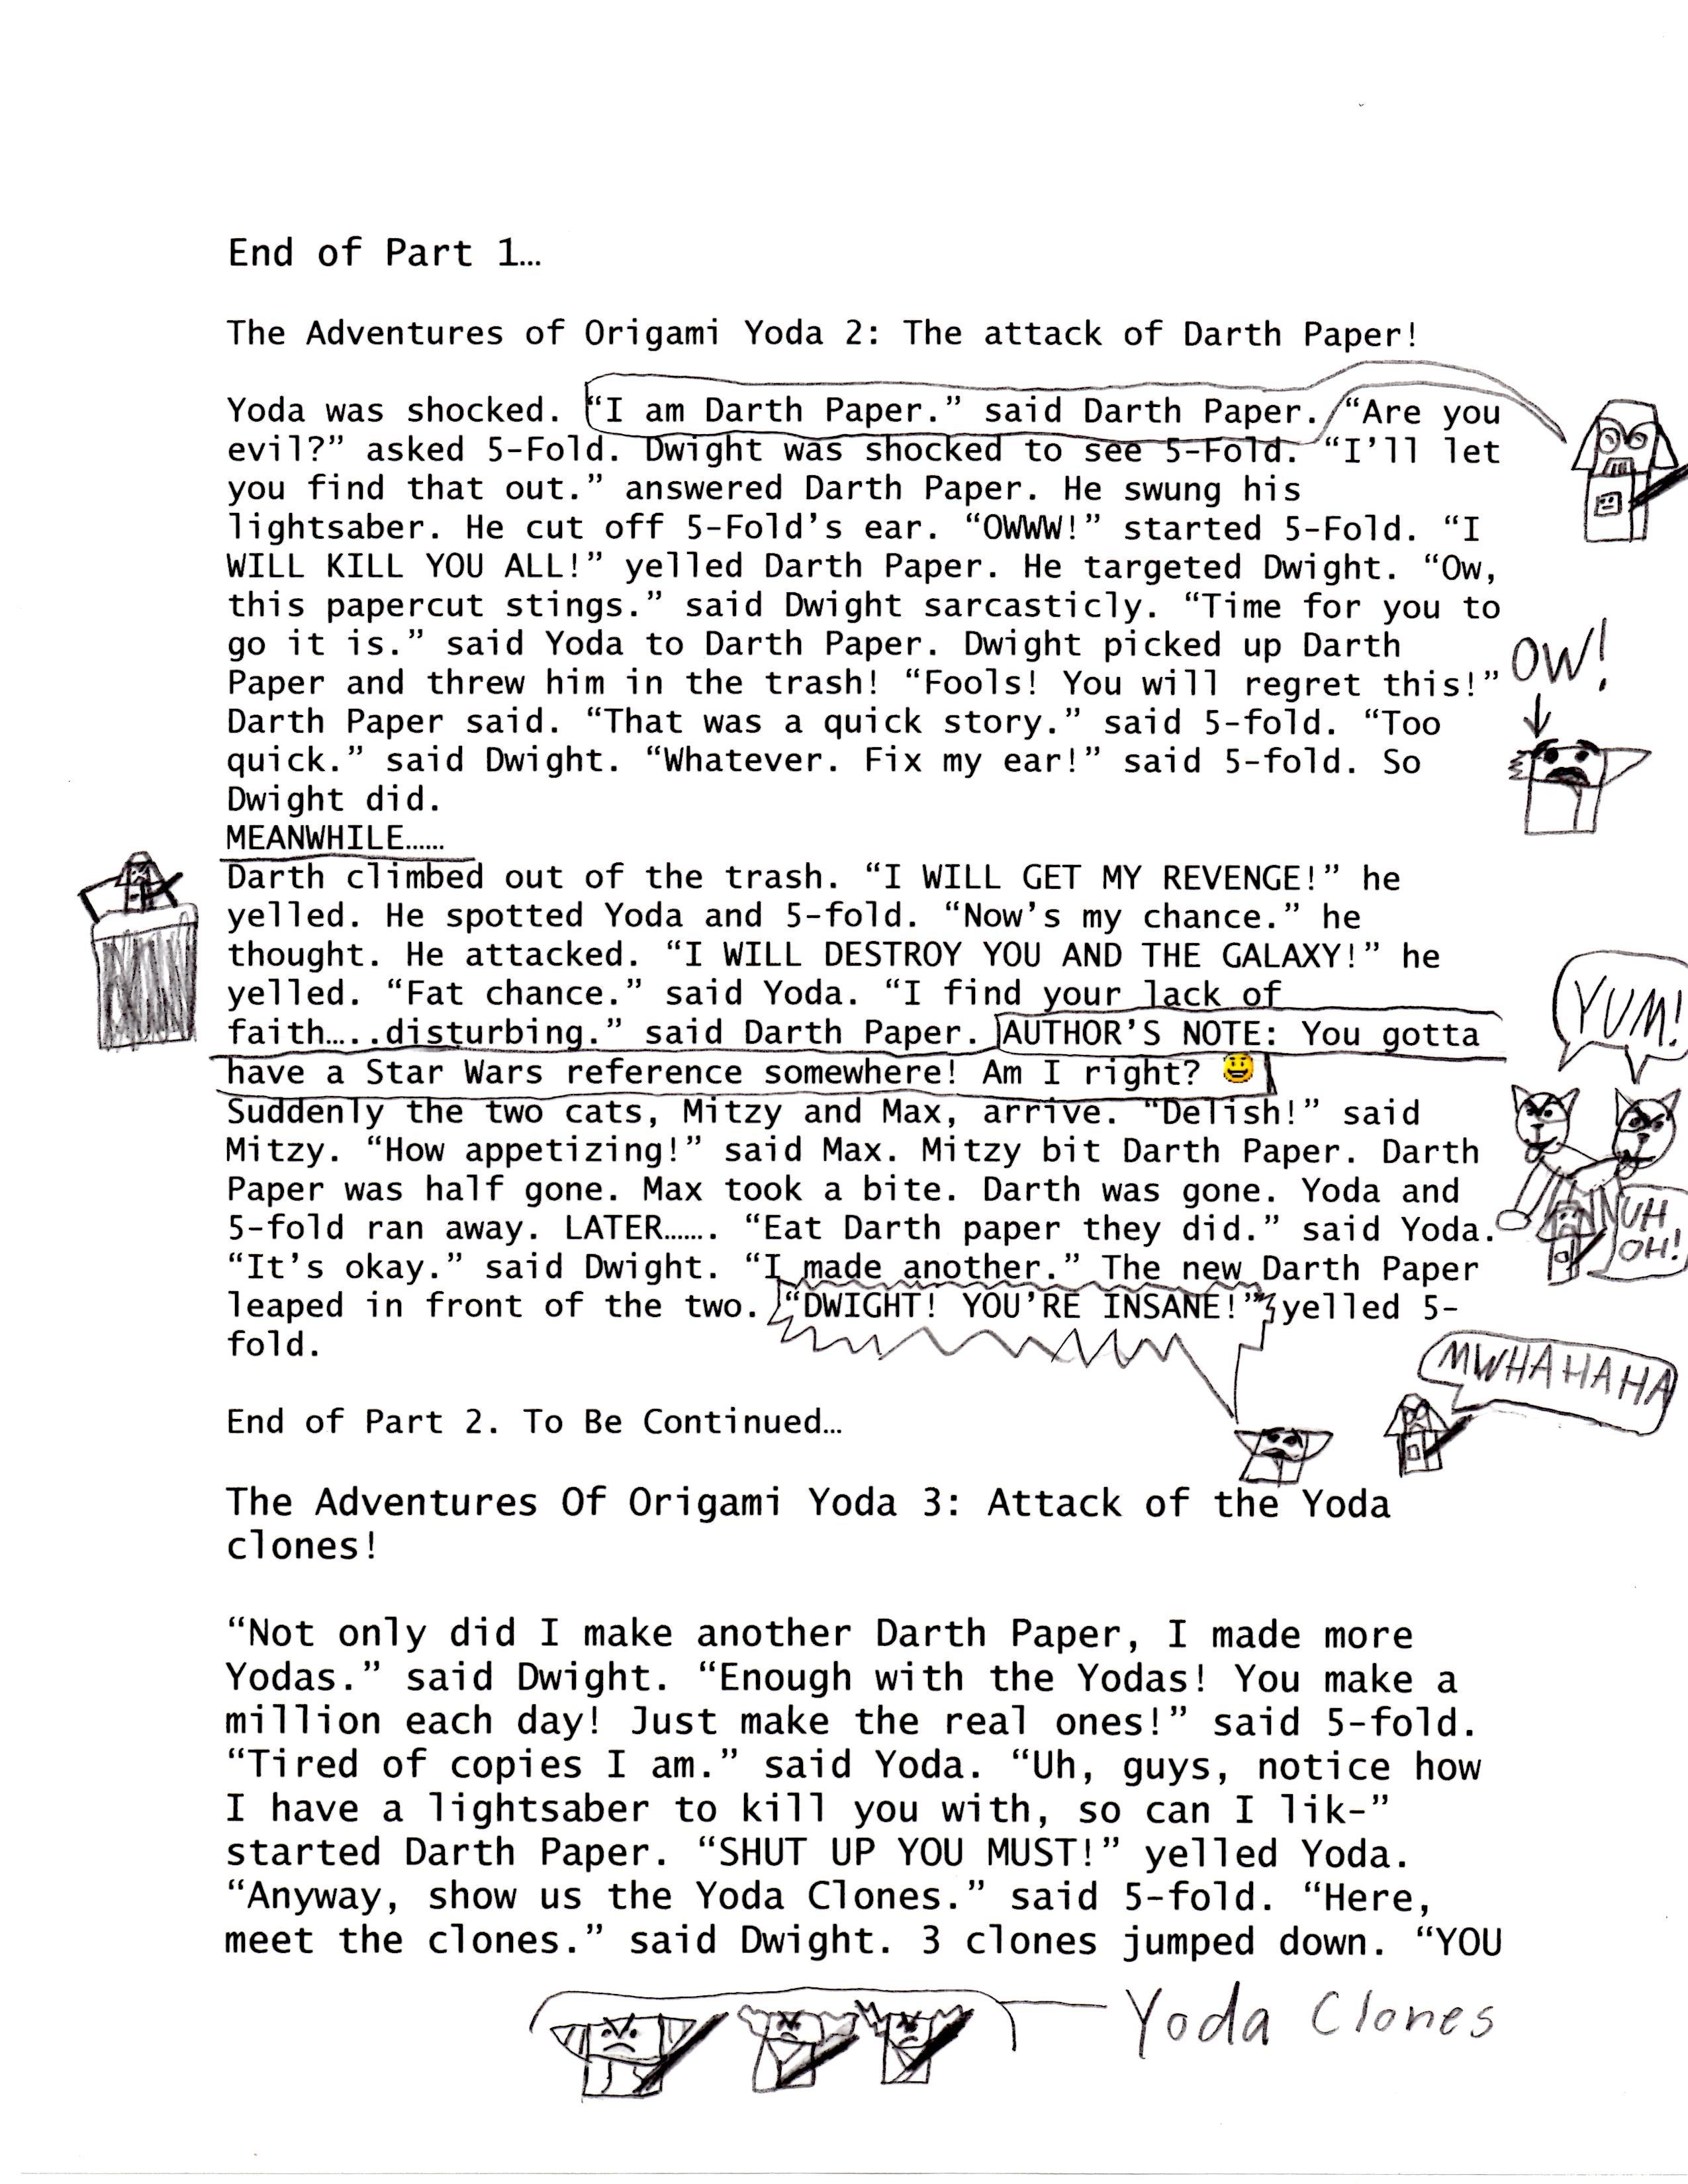 Episode 4 The Adventures Of Origami Yoda